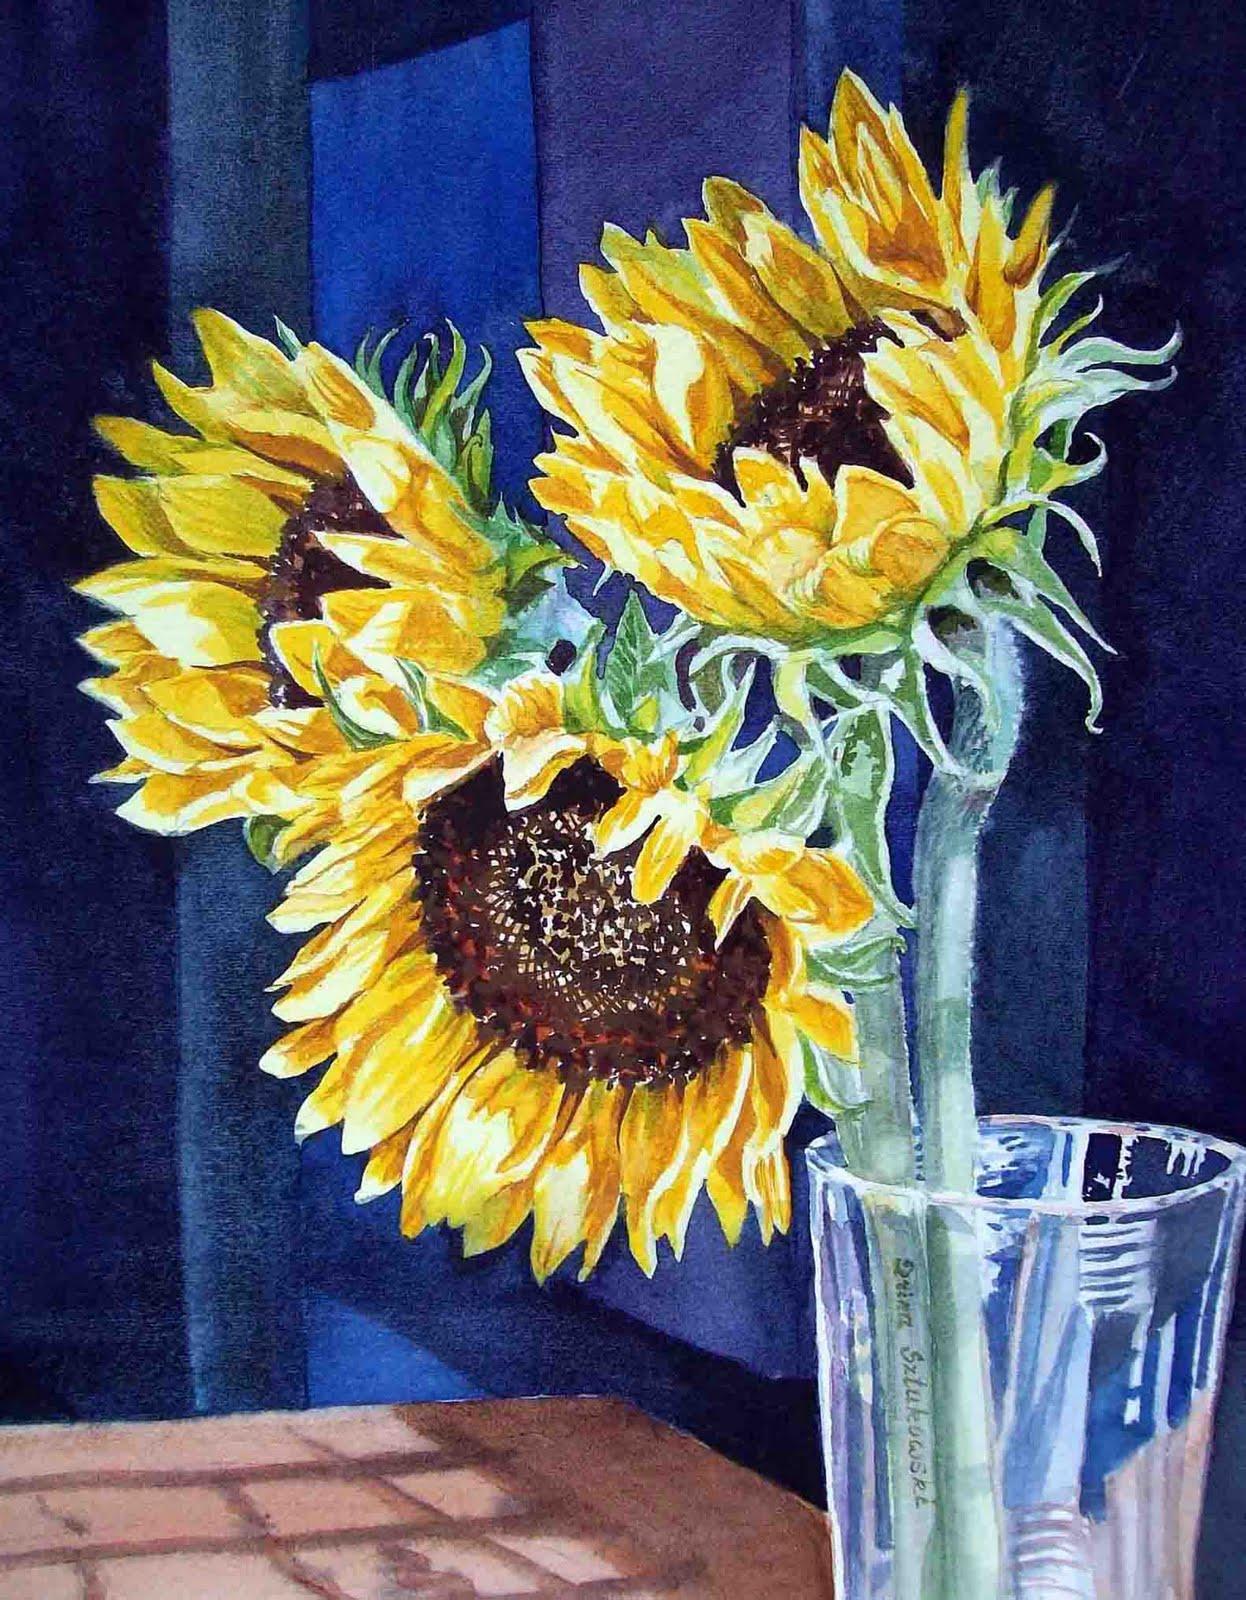 Irina sztukowski fine art sunflower painting for How to paint a sunflower on canvas